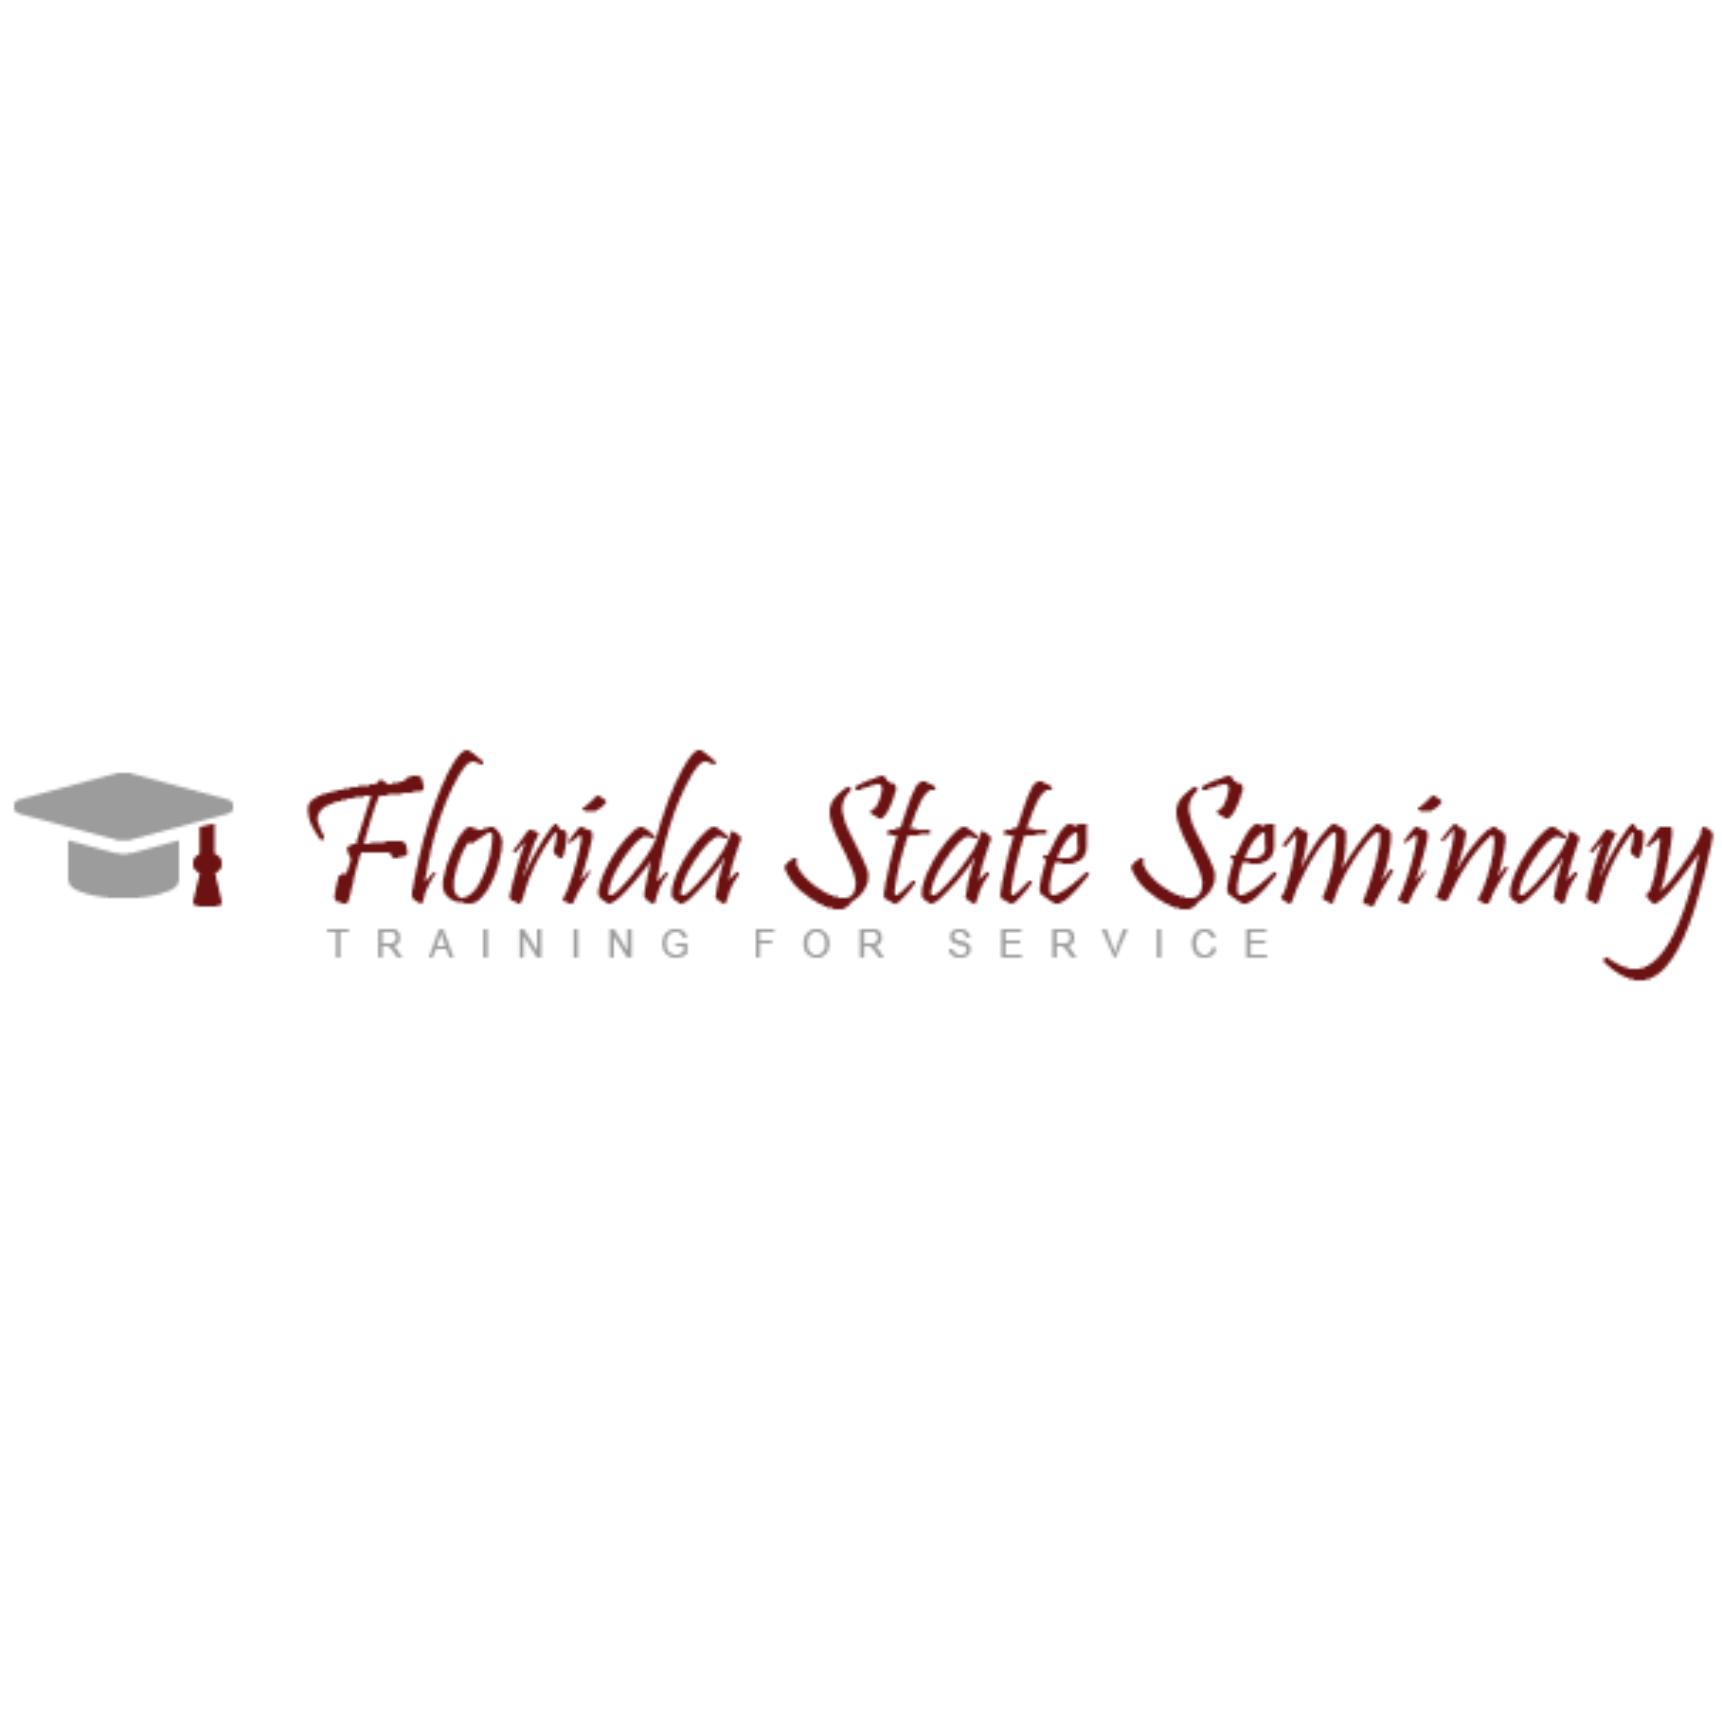 Florida State Seminary